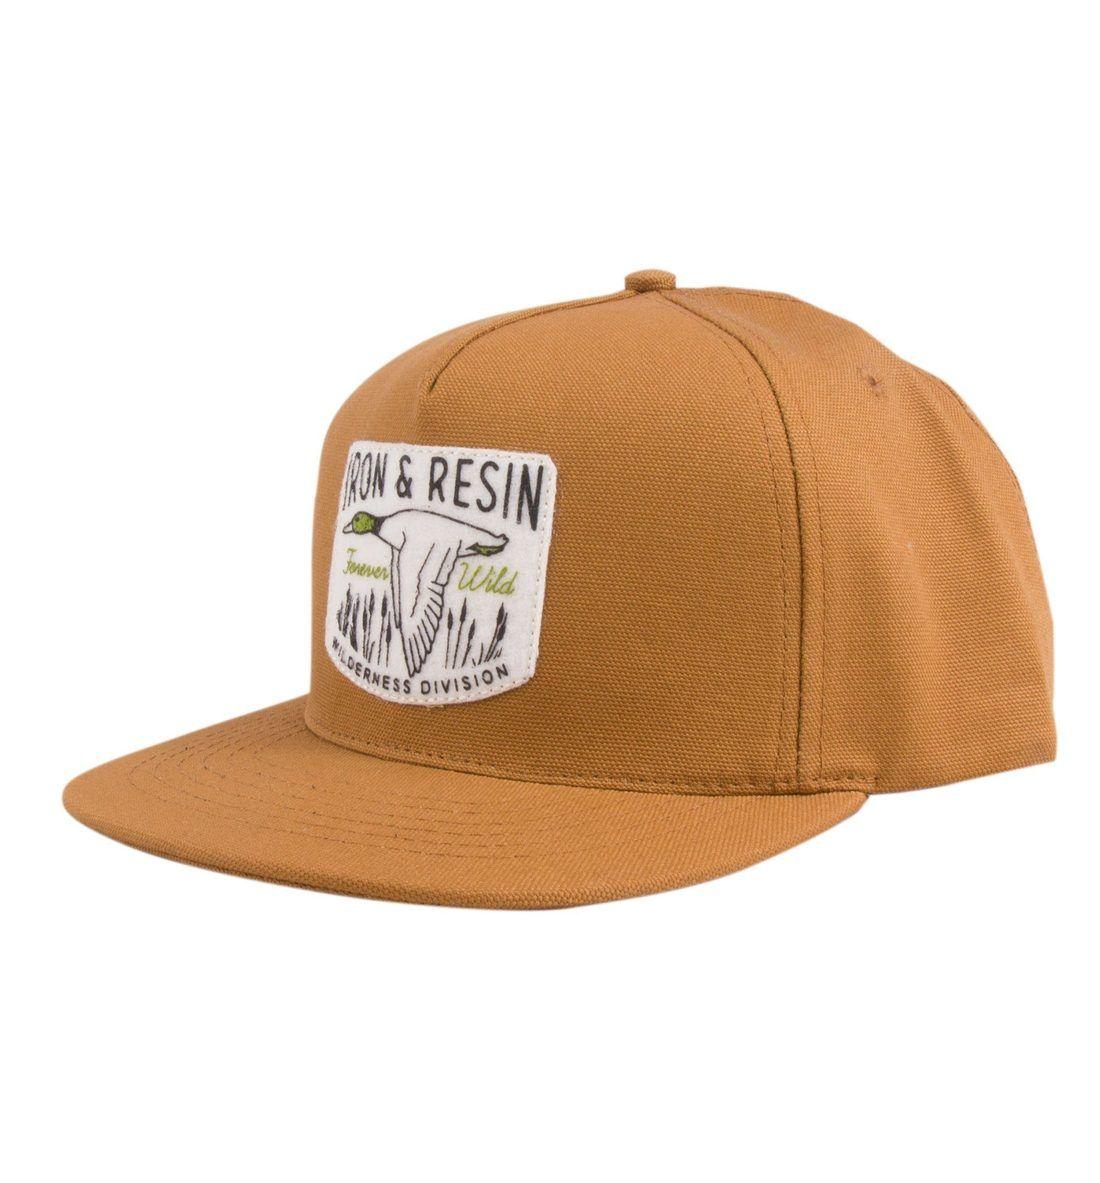 63dde4279eb Wilderness Hat - Headwear - Iron and Resin